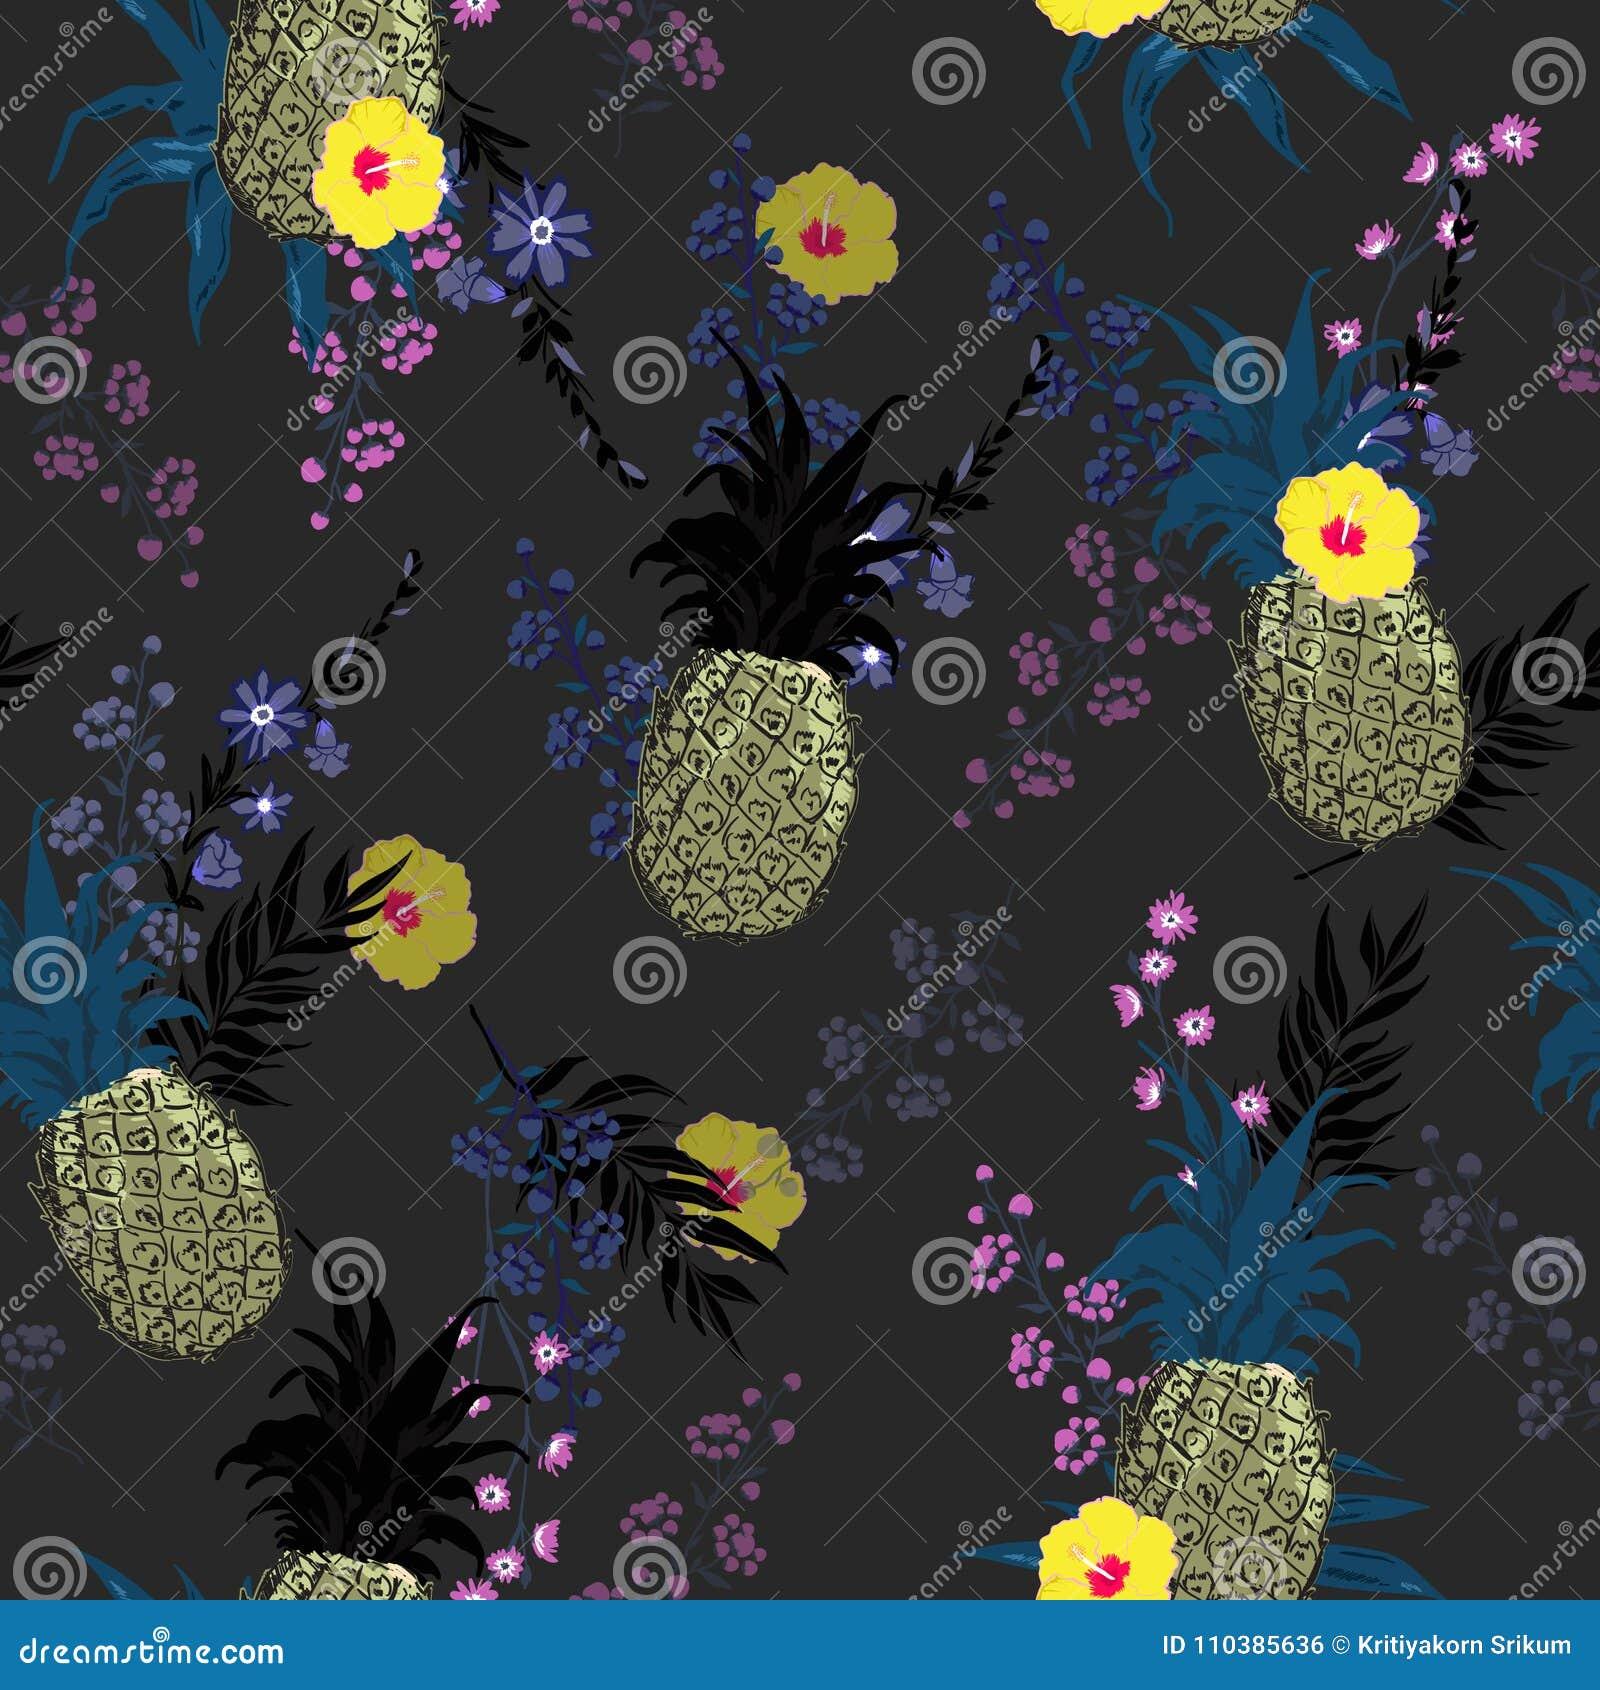 74cd3f4642d1e Beautiful Summer Dark Night Seamless Vector Floral Print Pattern ...